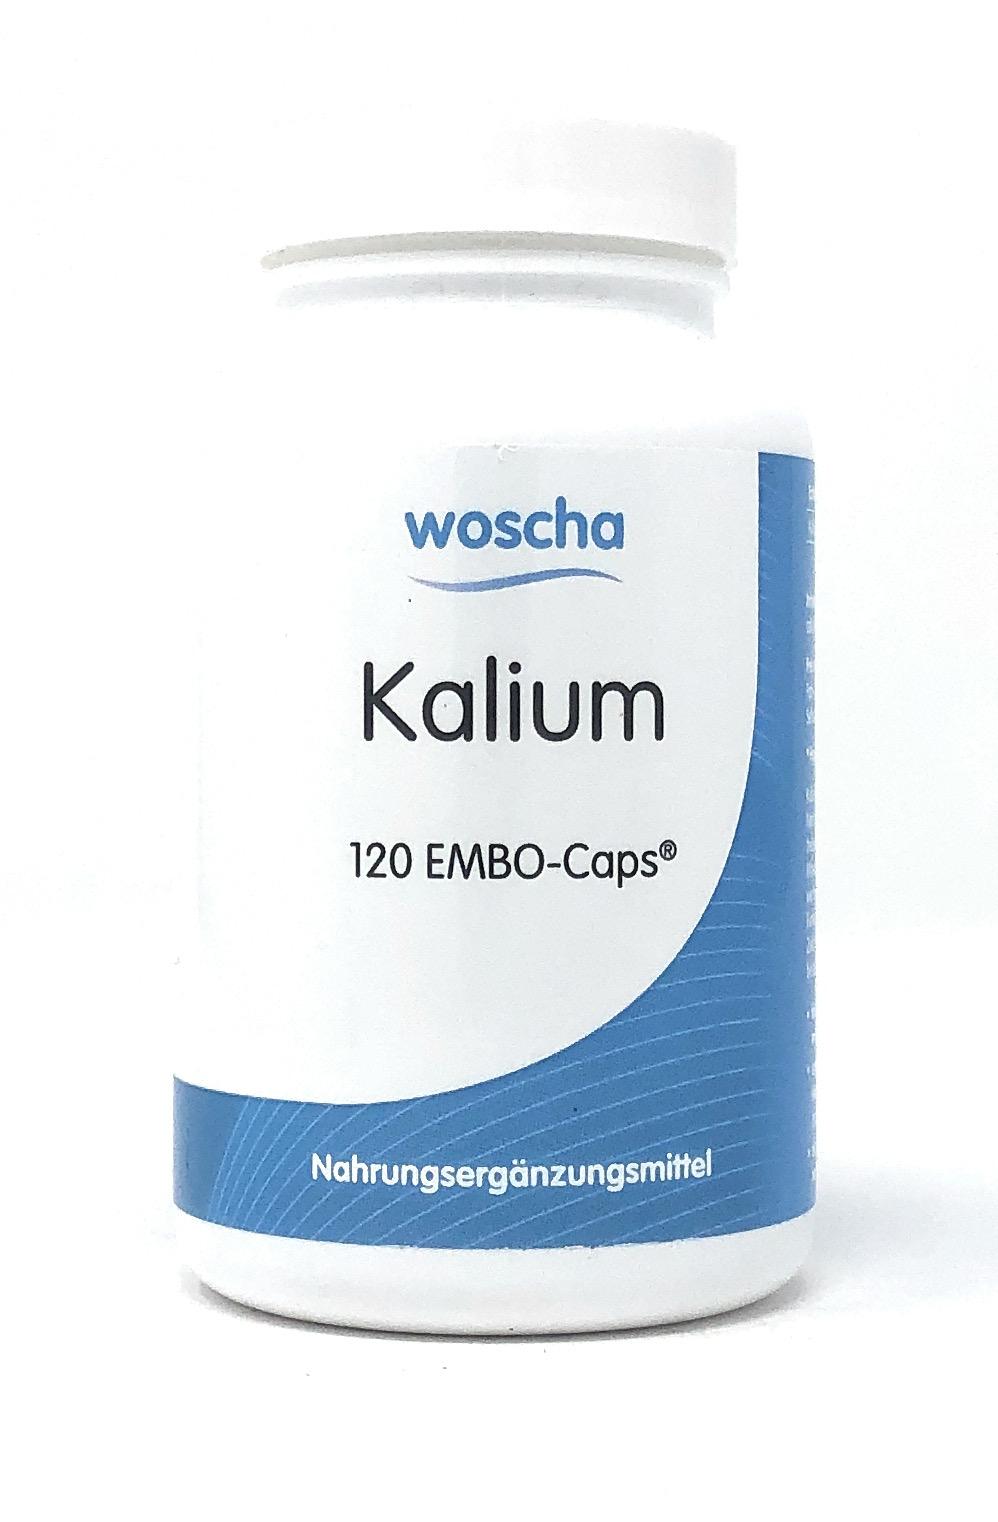 woscha KALIUM 120 Embo-Kaps (100g) (vegan)